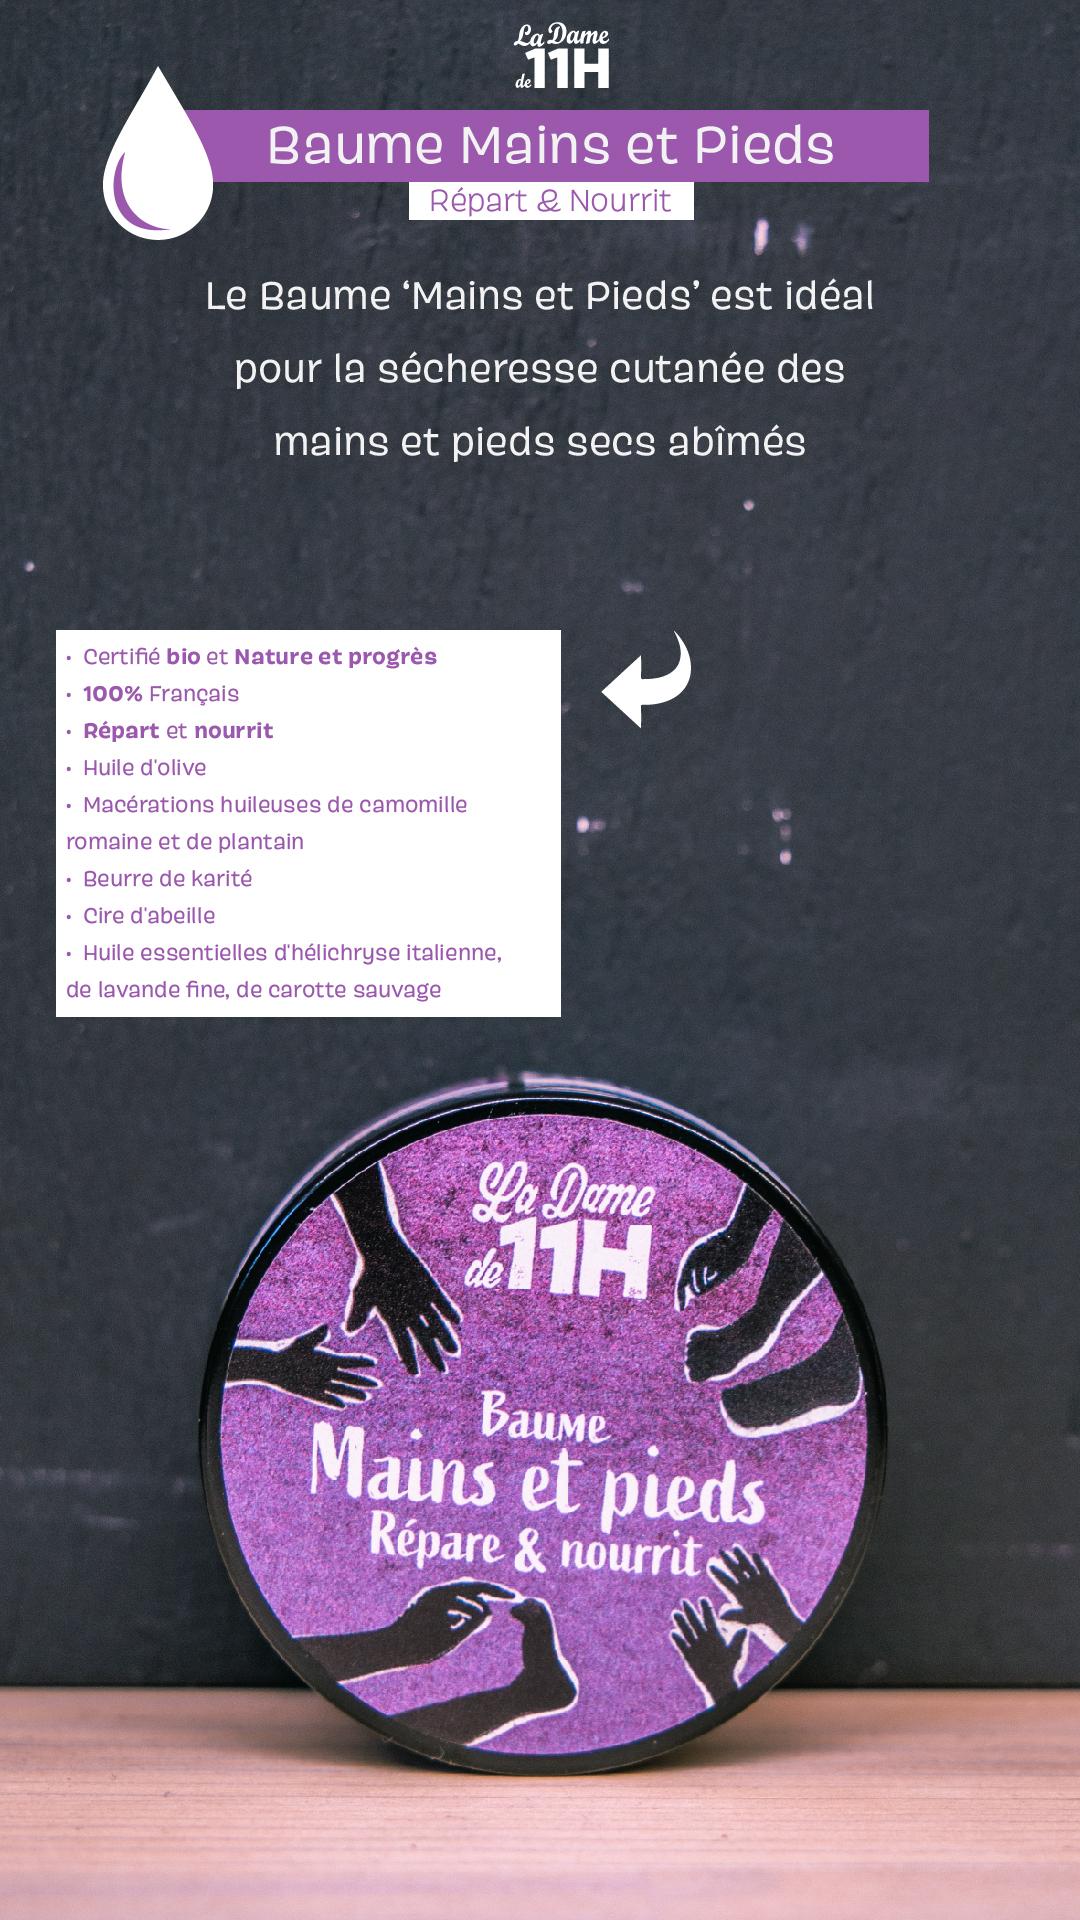 Baume_11H_Main-Pieds